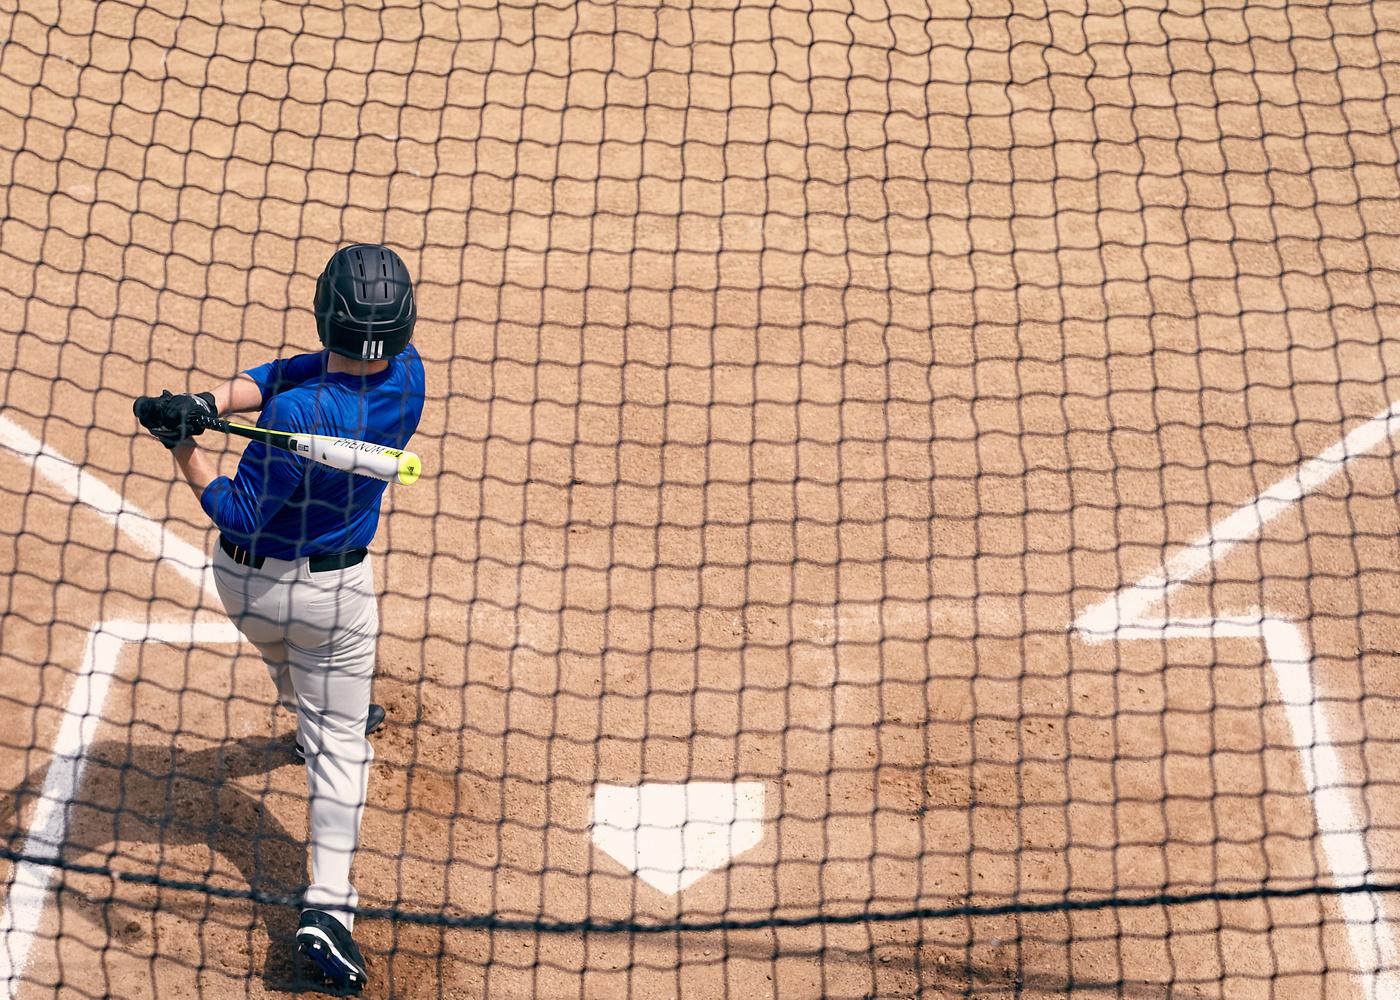 Baseball by Daniel Baca